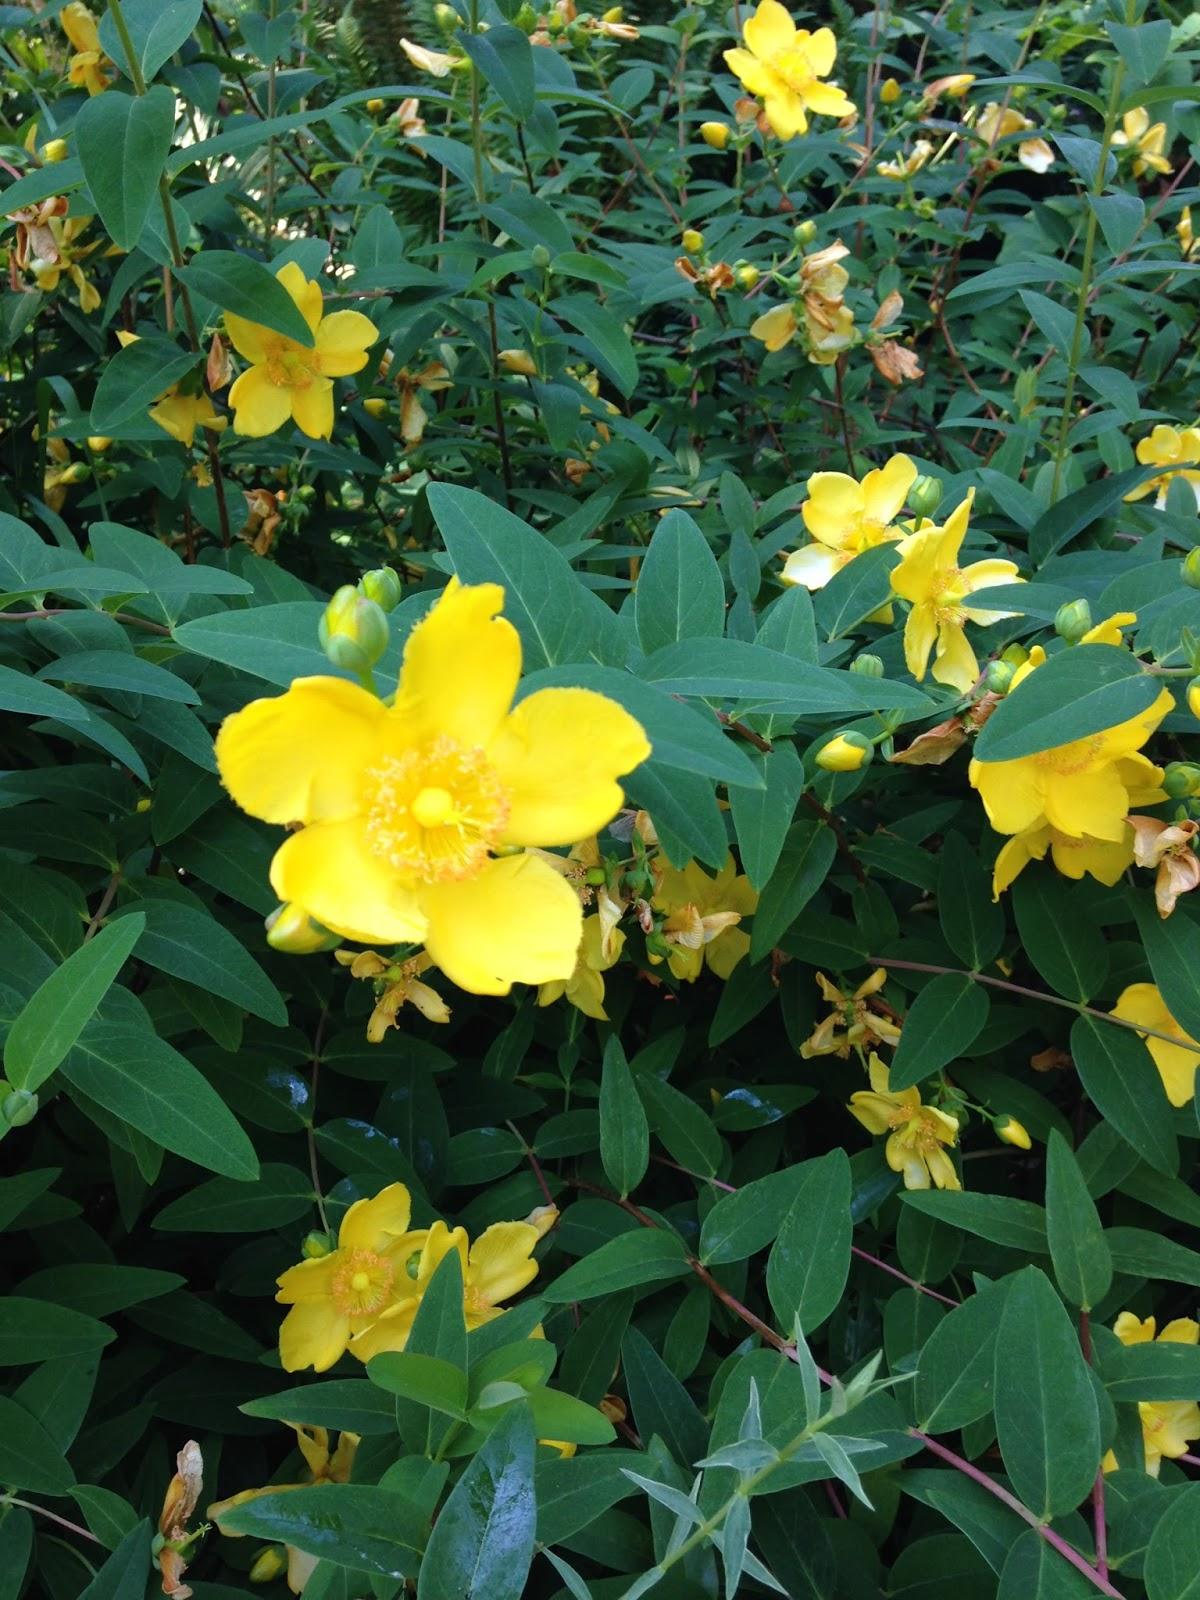 aerin u0026 39 s cranberry blog  flowers in british columbia